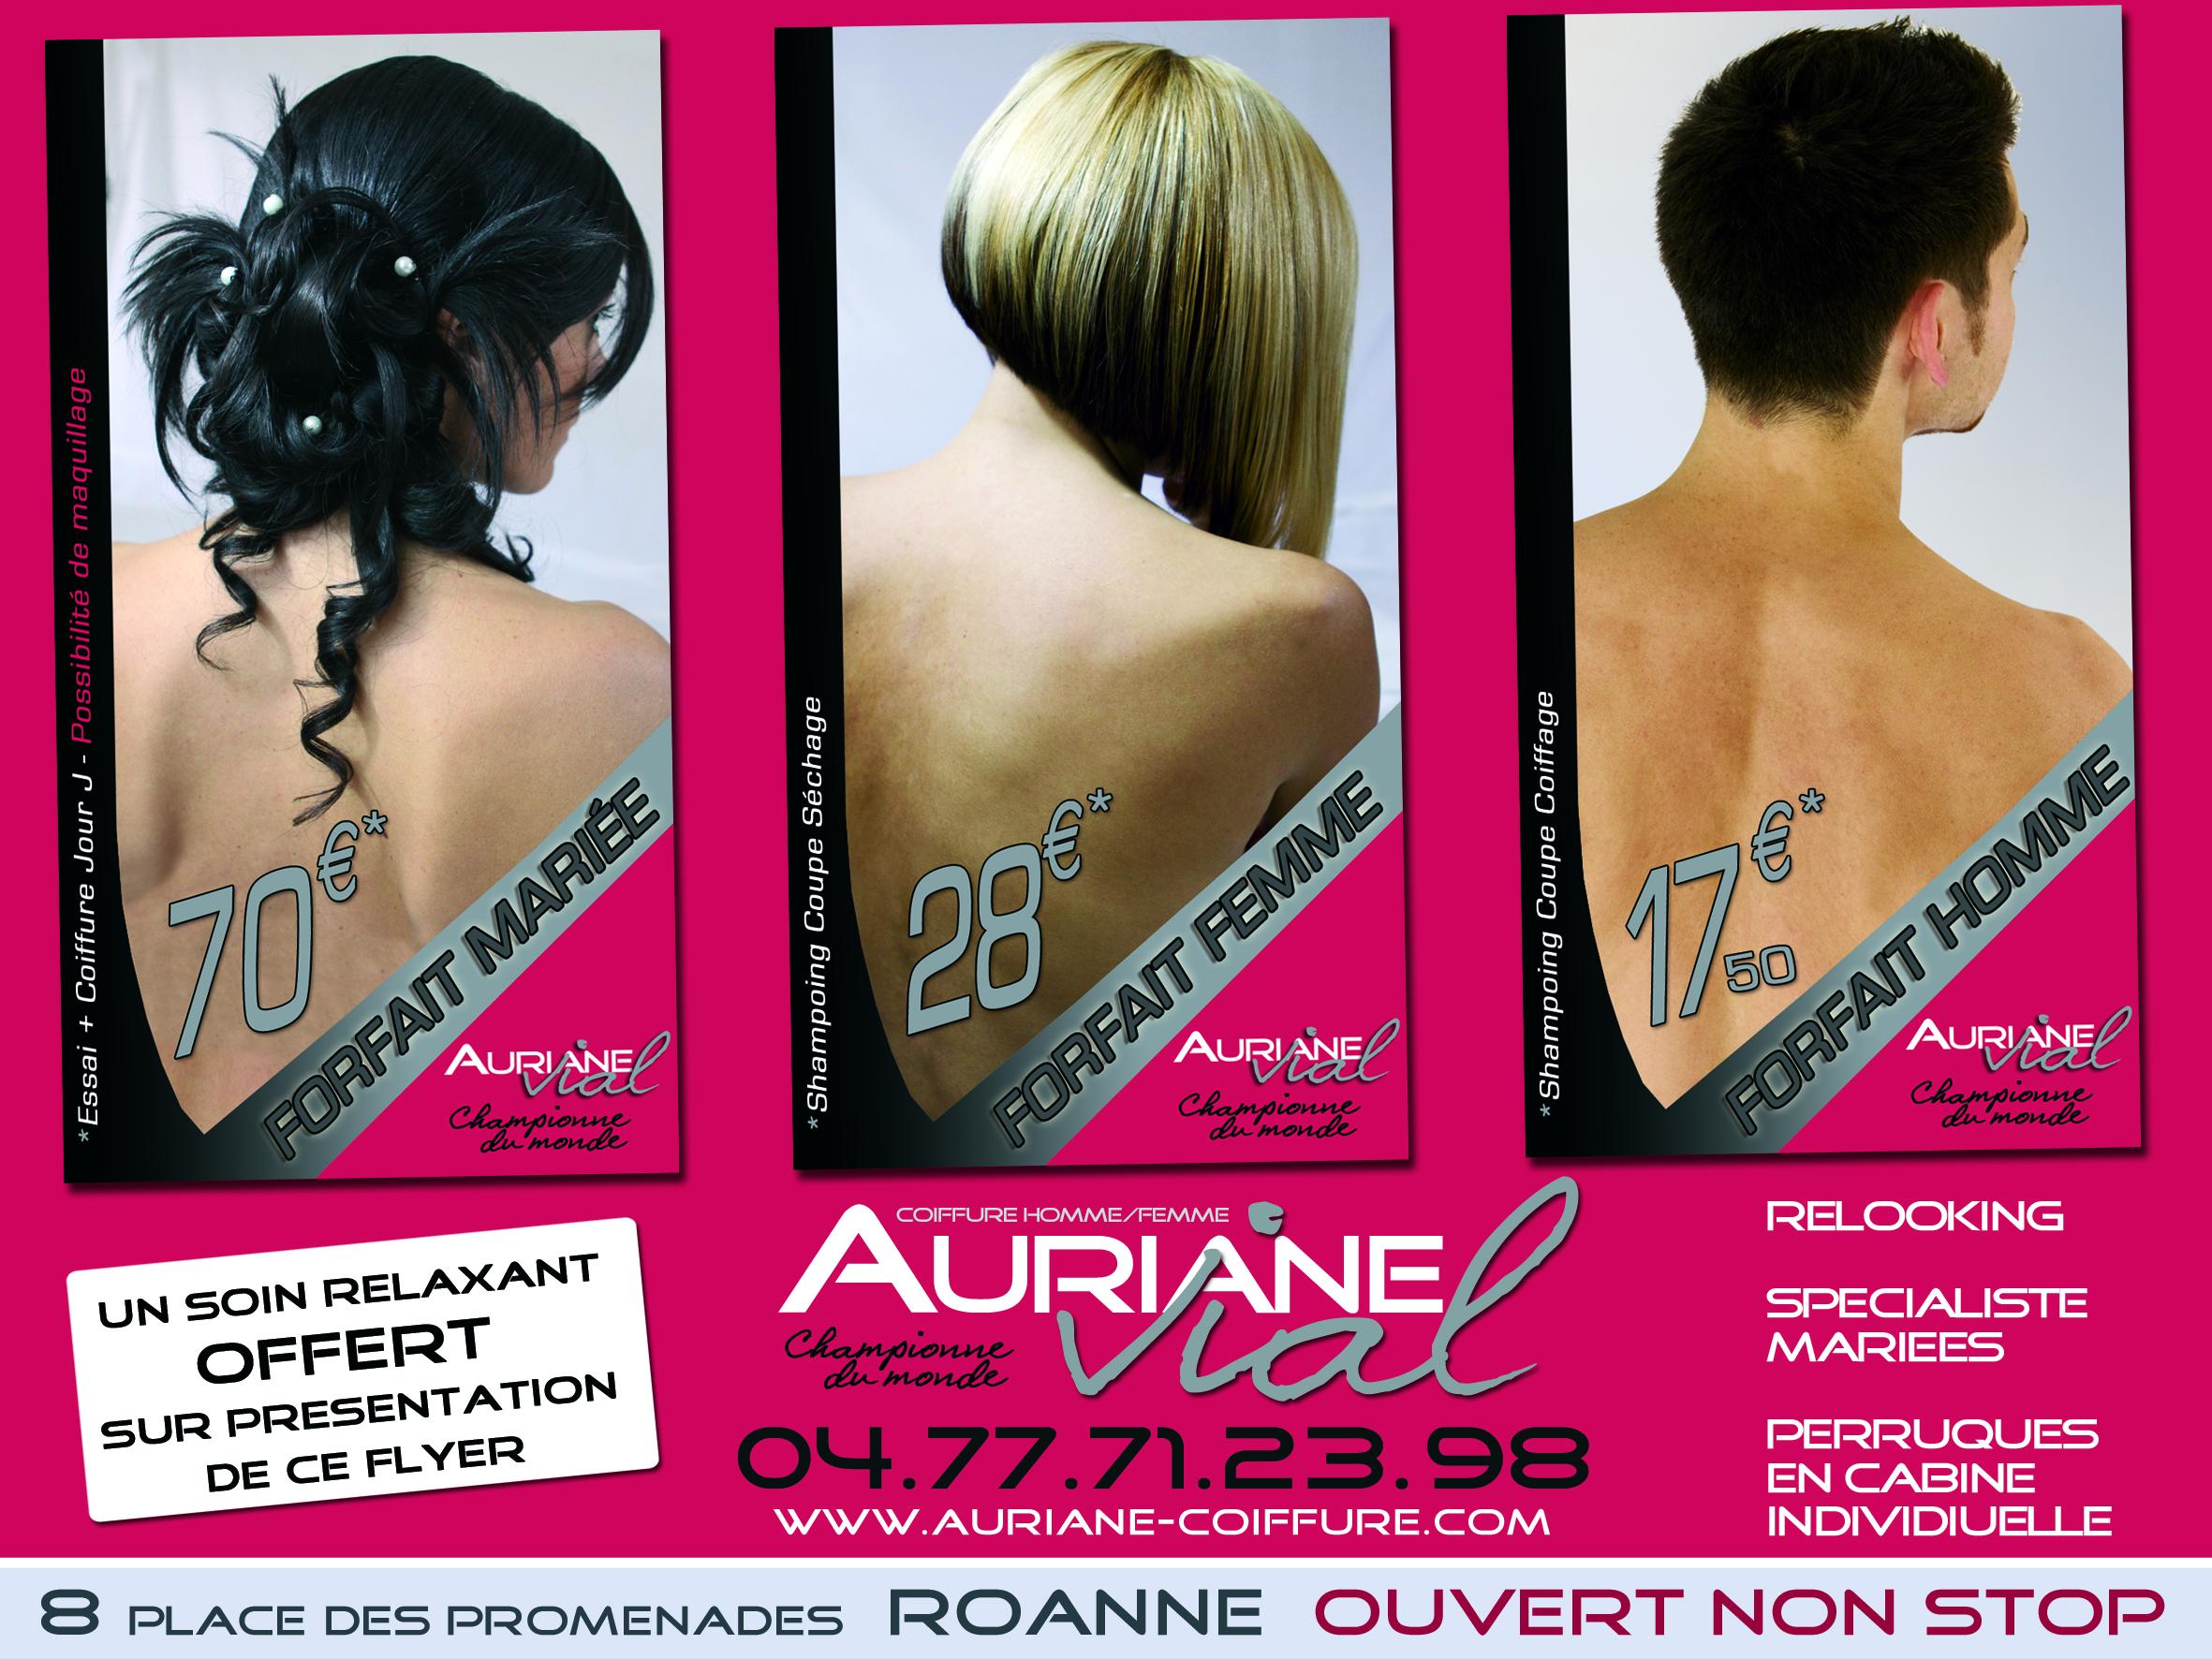 Vial Auriane - Roanne